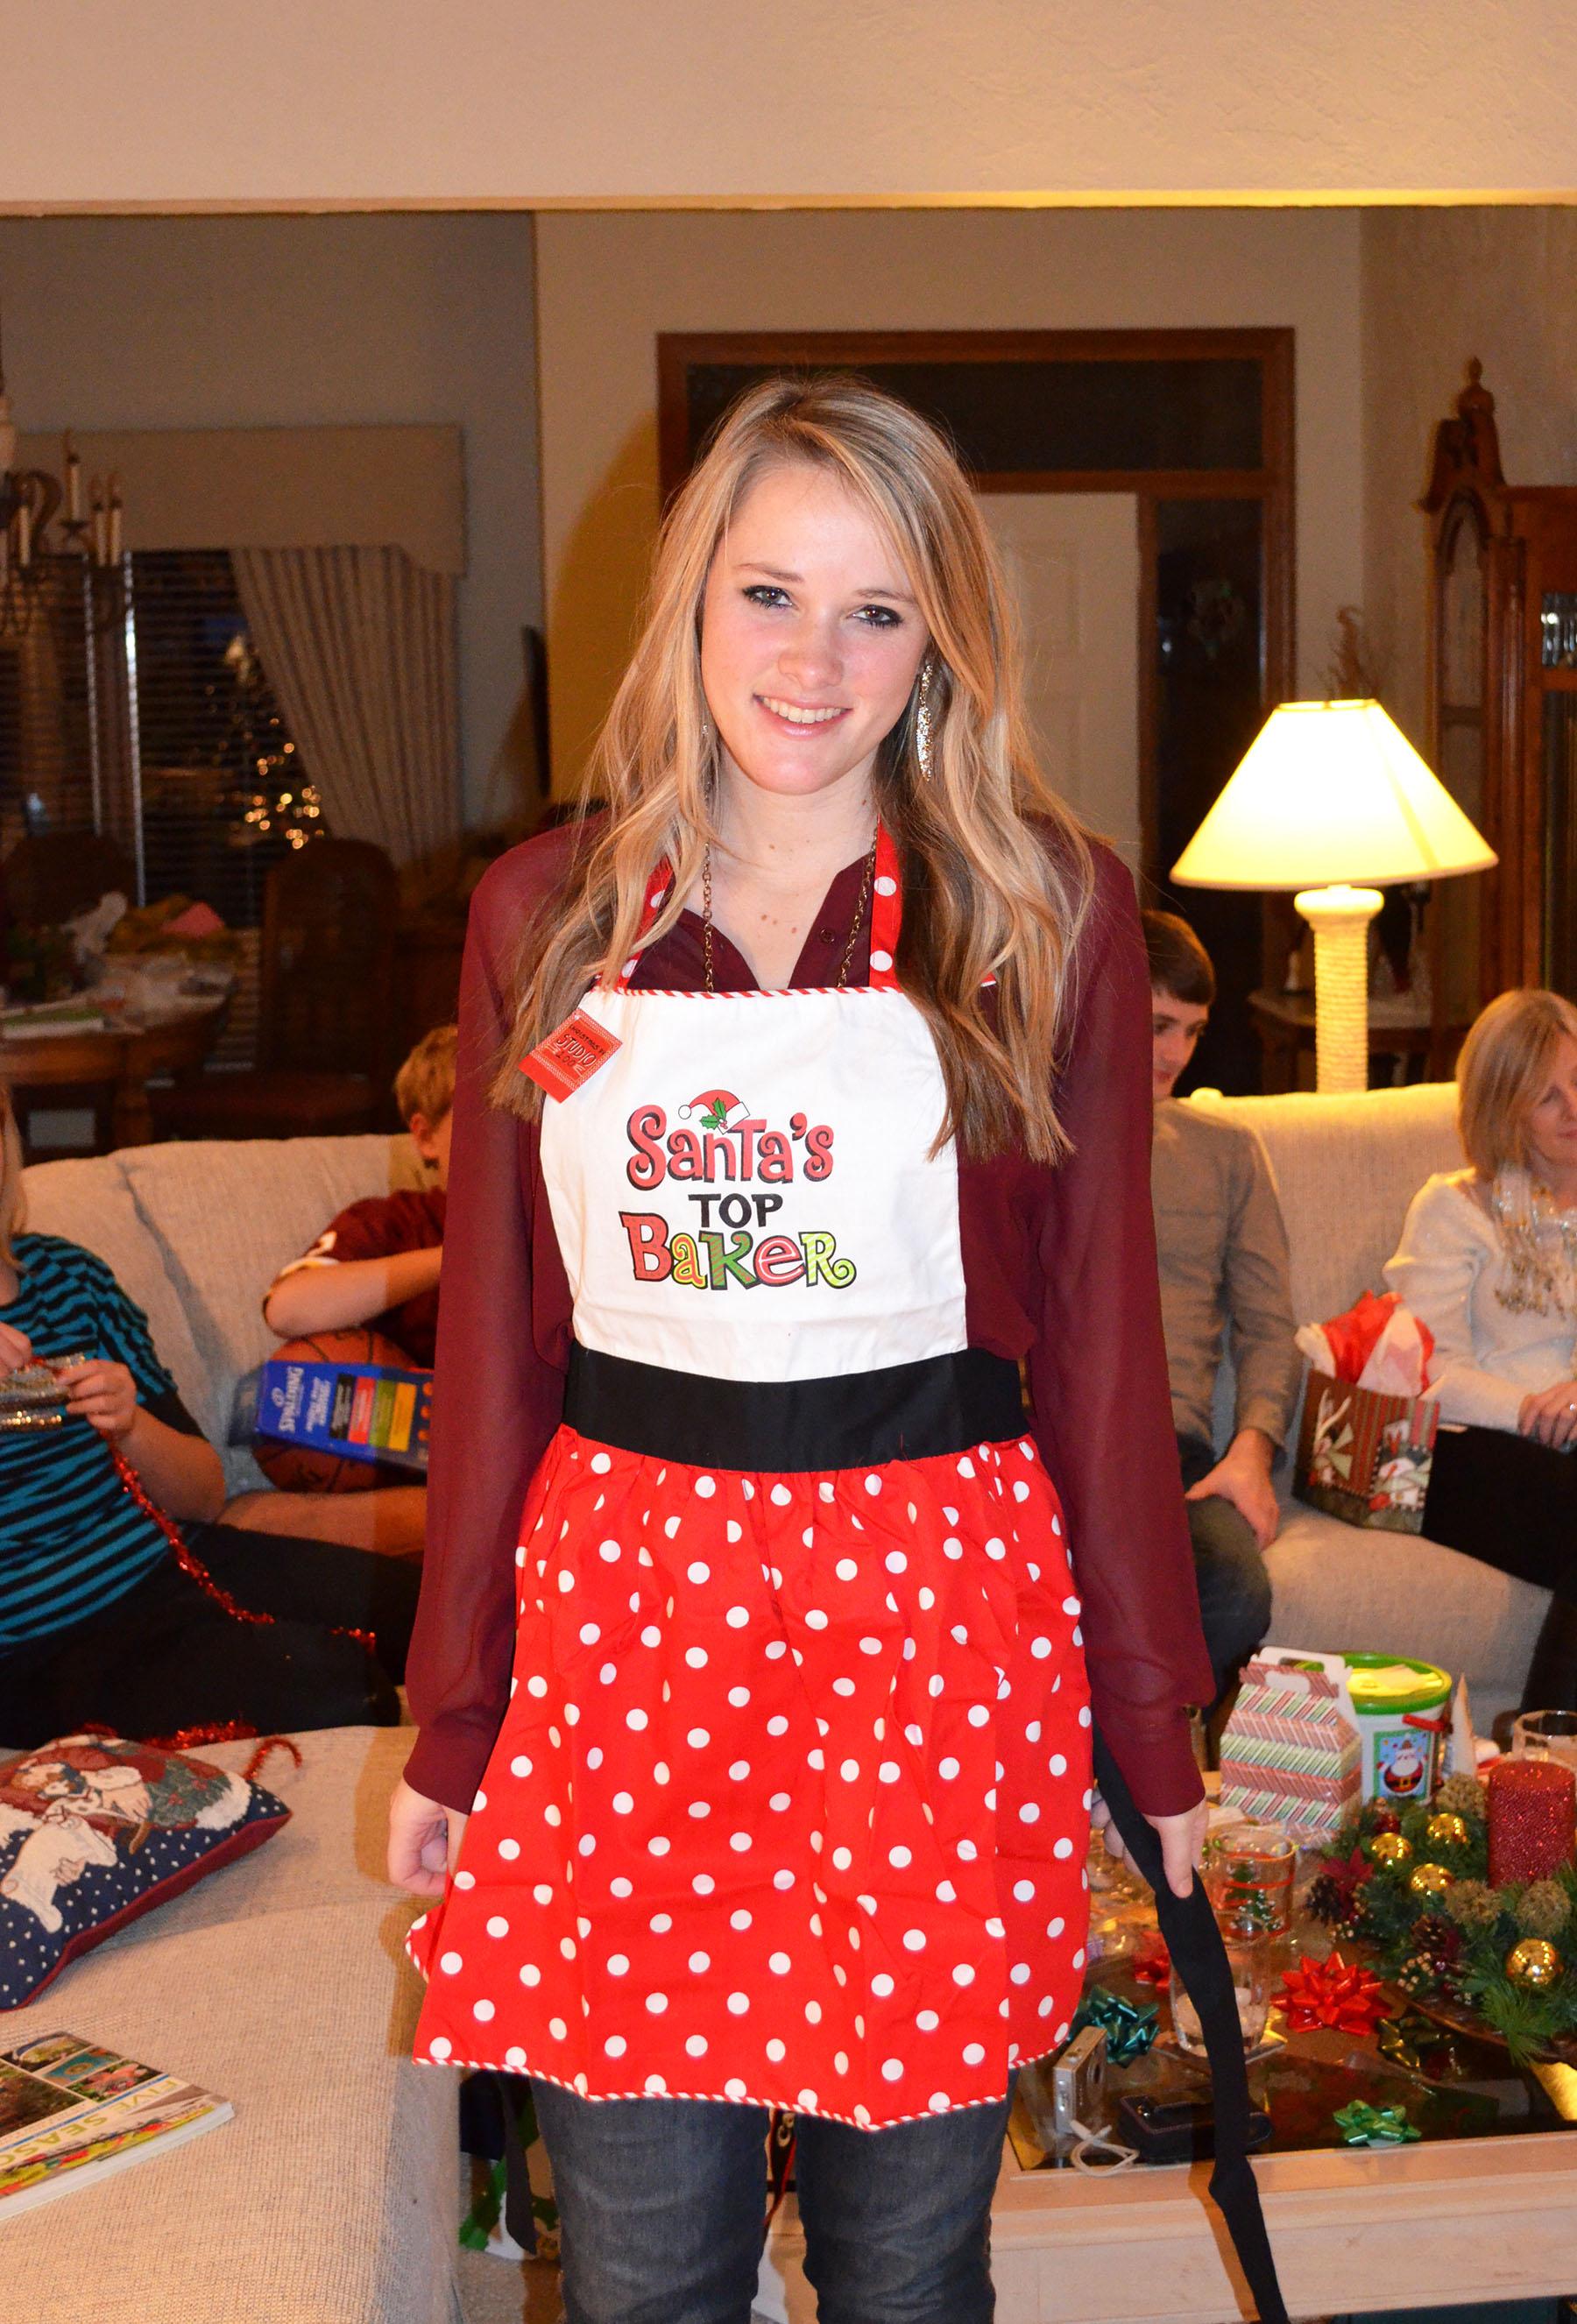 Santa's Top Baker!